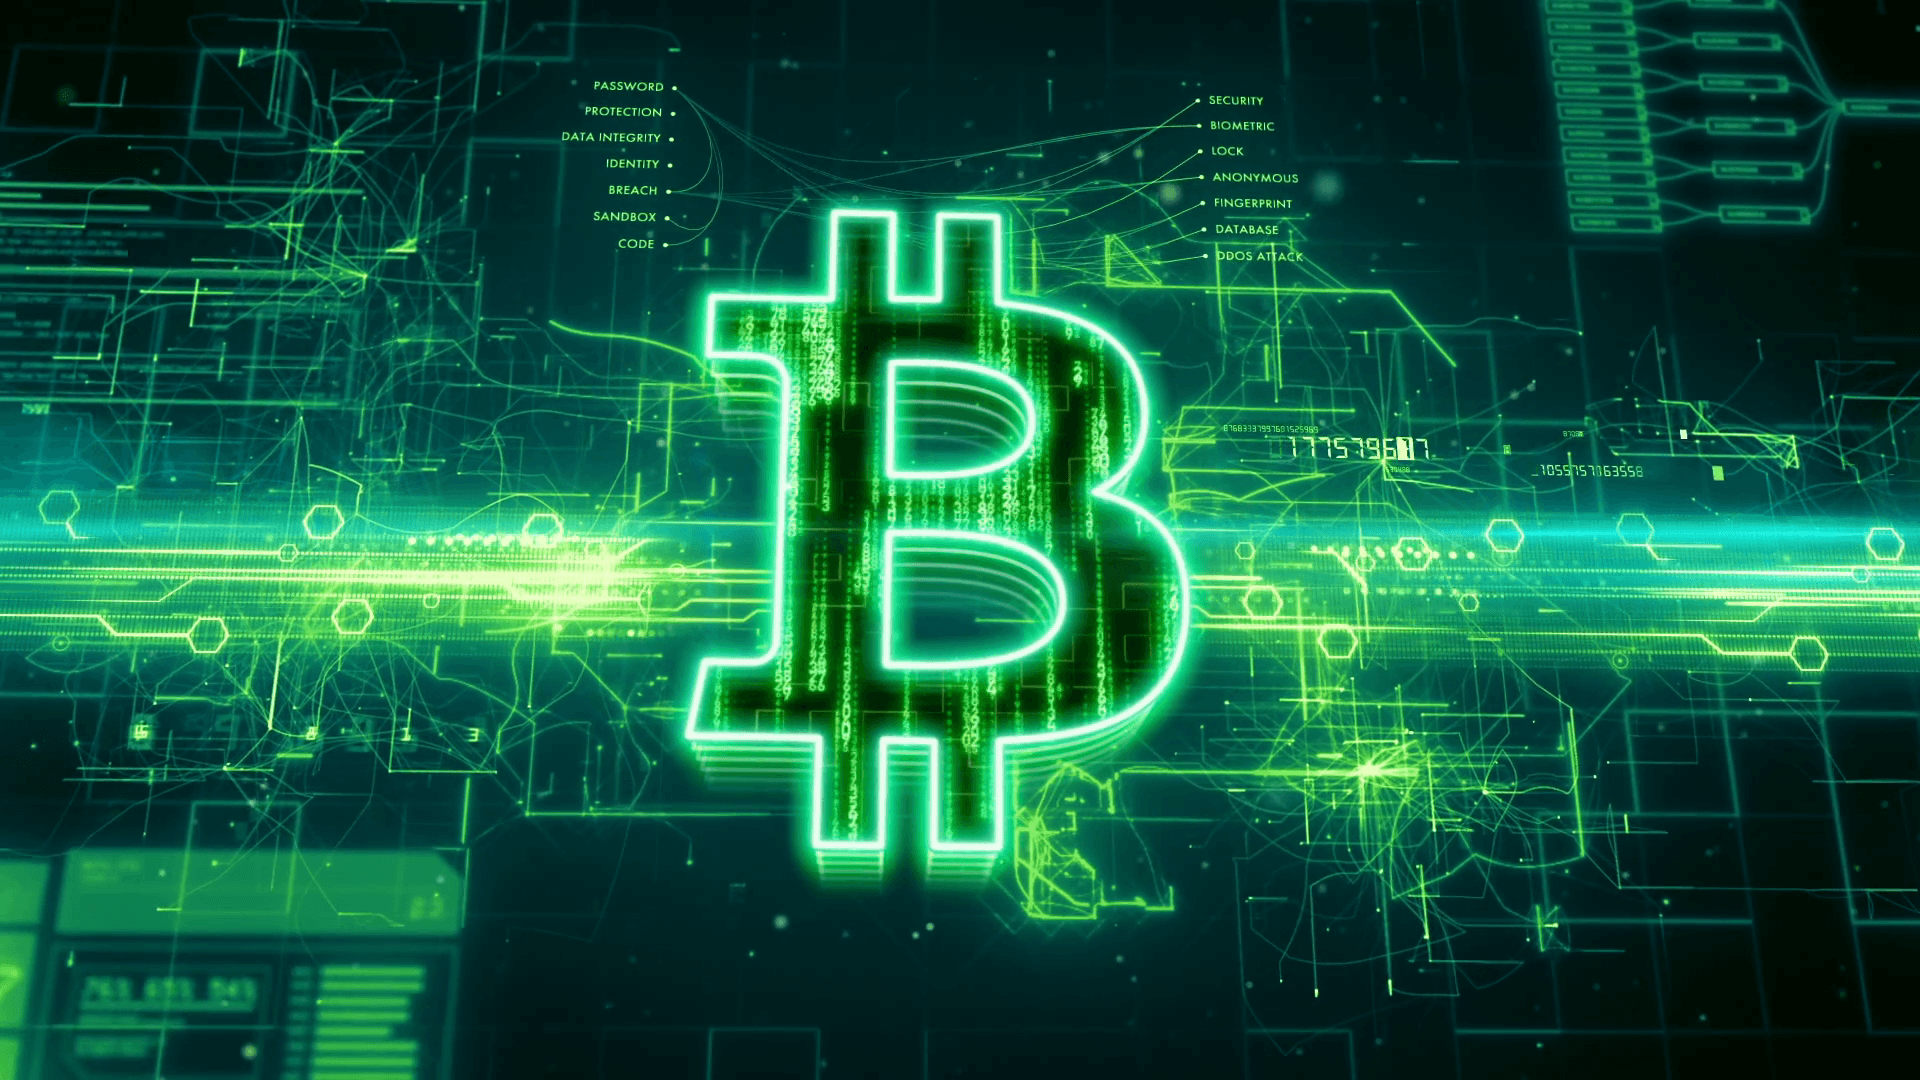 4K Bitcoin Wallpapers   Top 4K Bitcoin Backgrounds 1920x1080